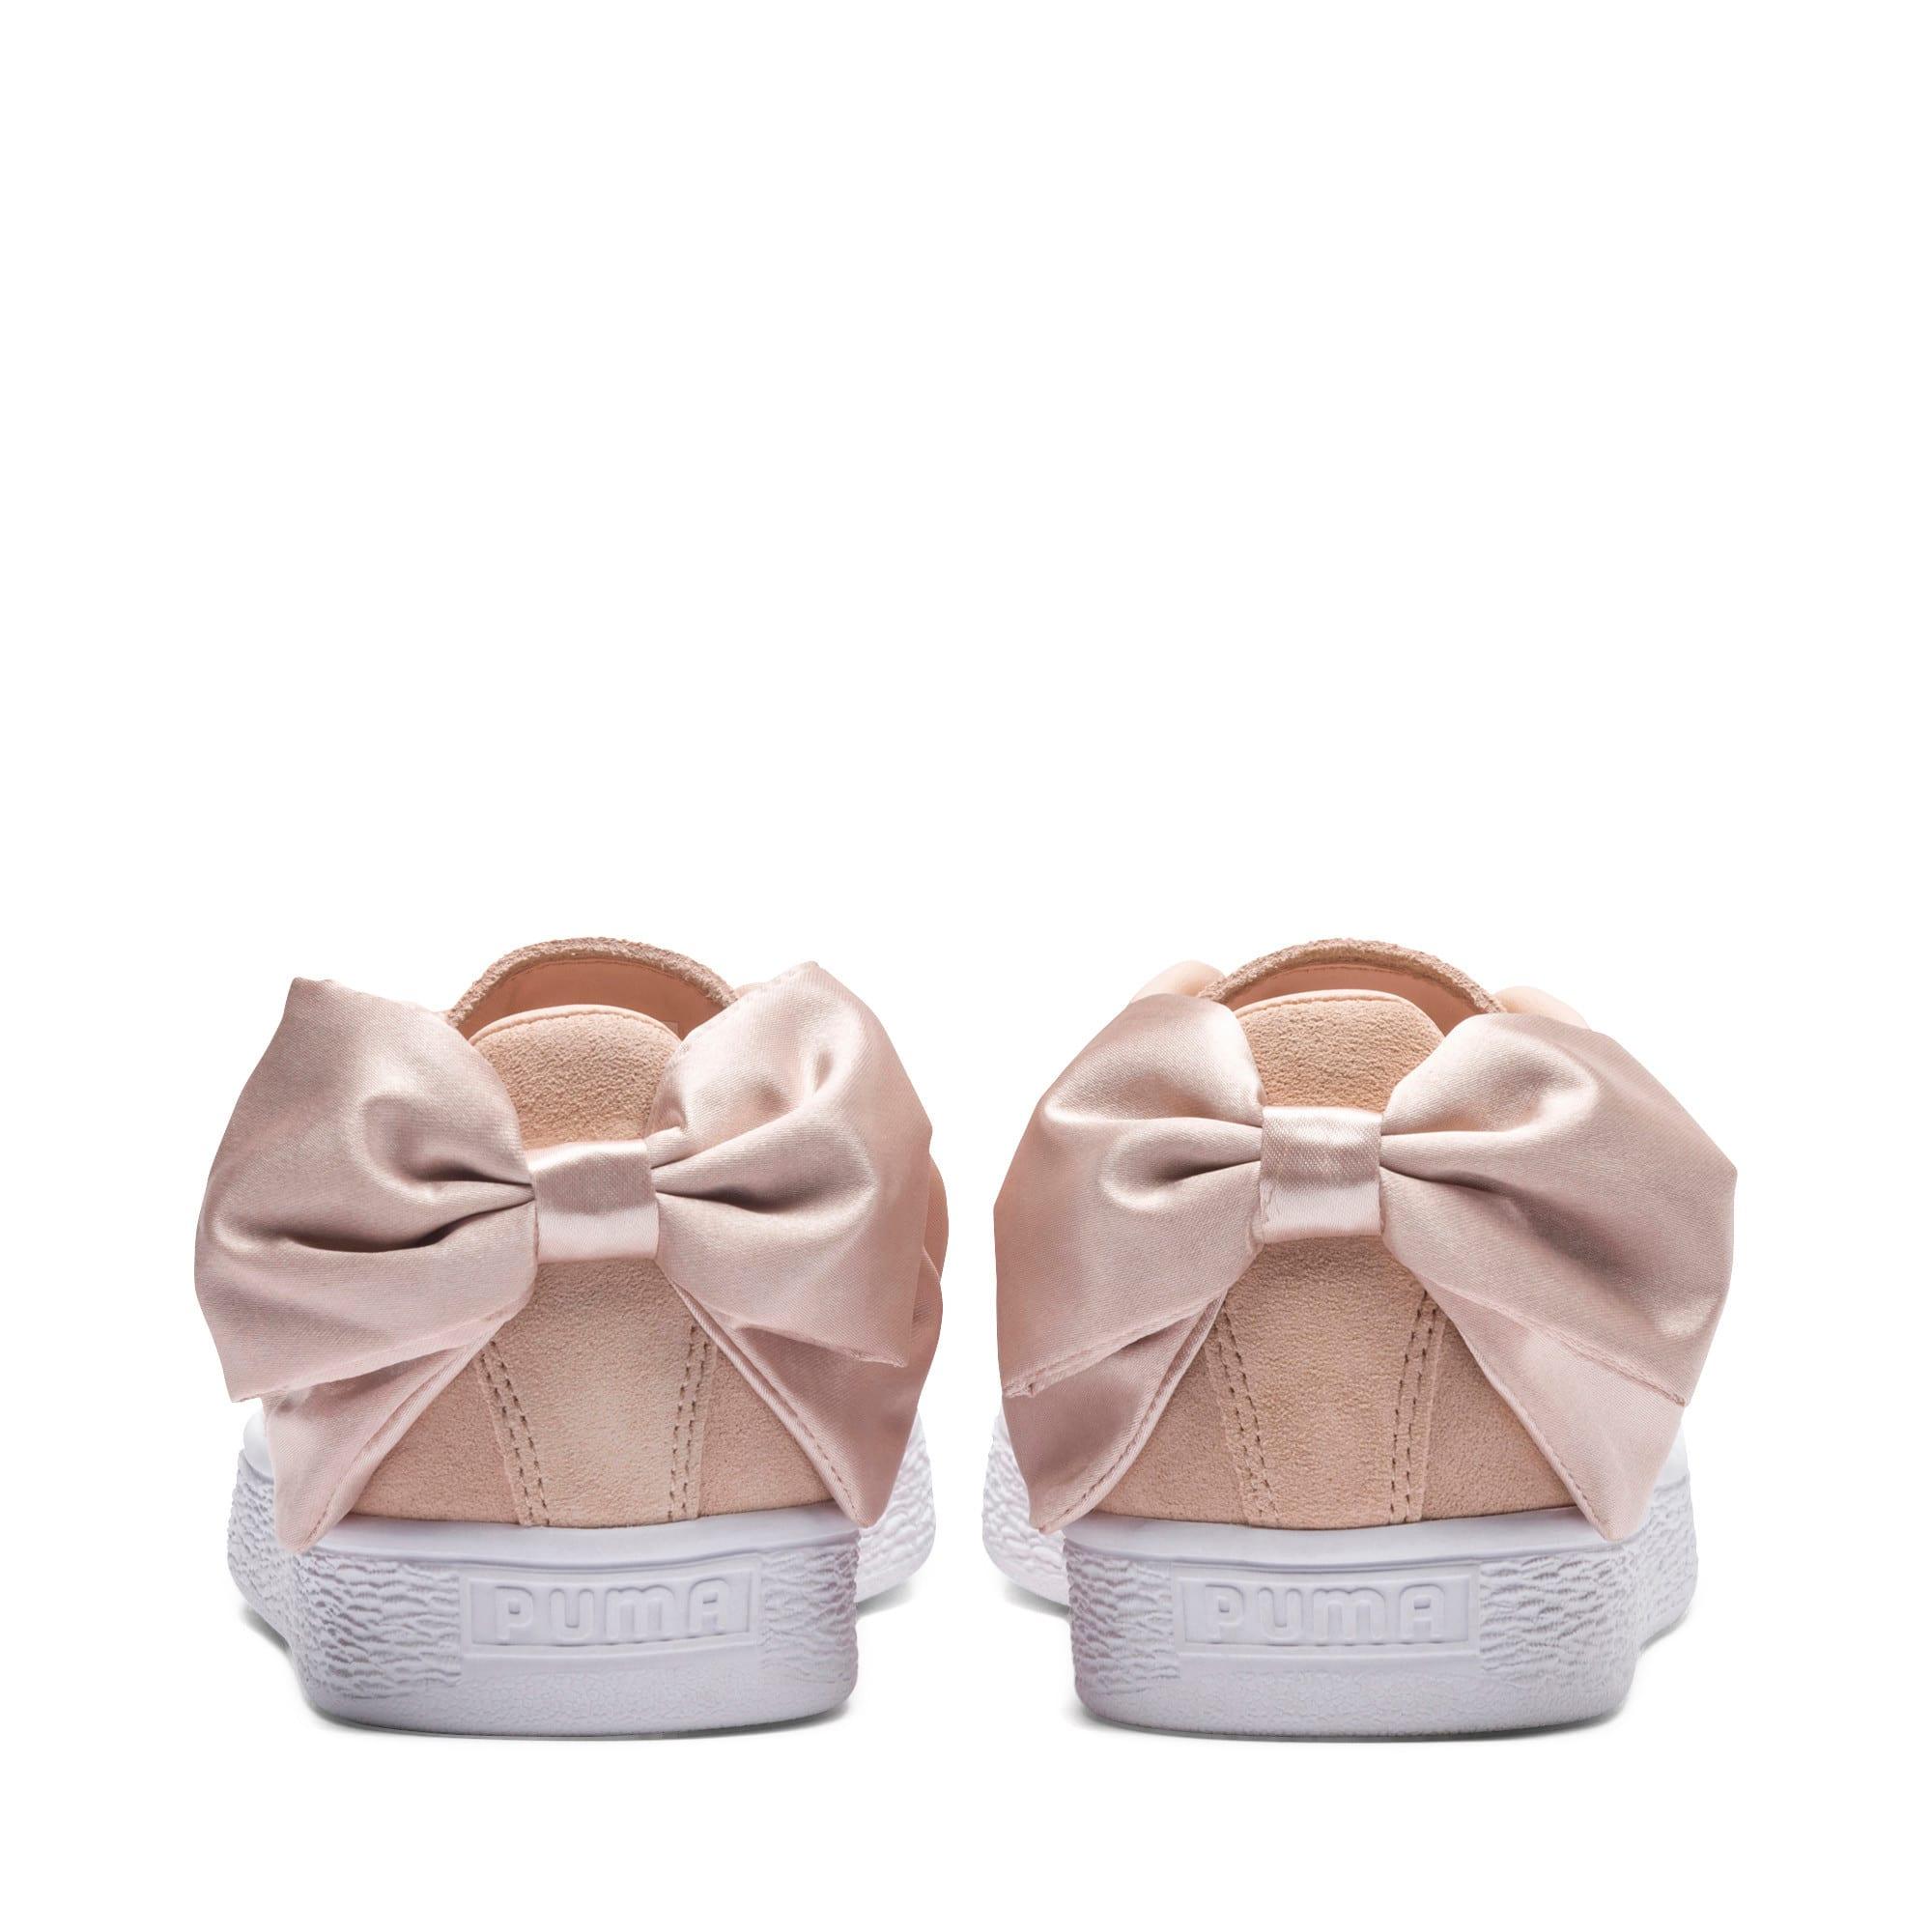 Thumbnail 4 of Basket Suede Bow Valentine pour femme, Cream Tan-Puma White, medium